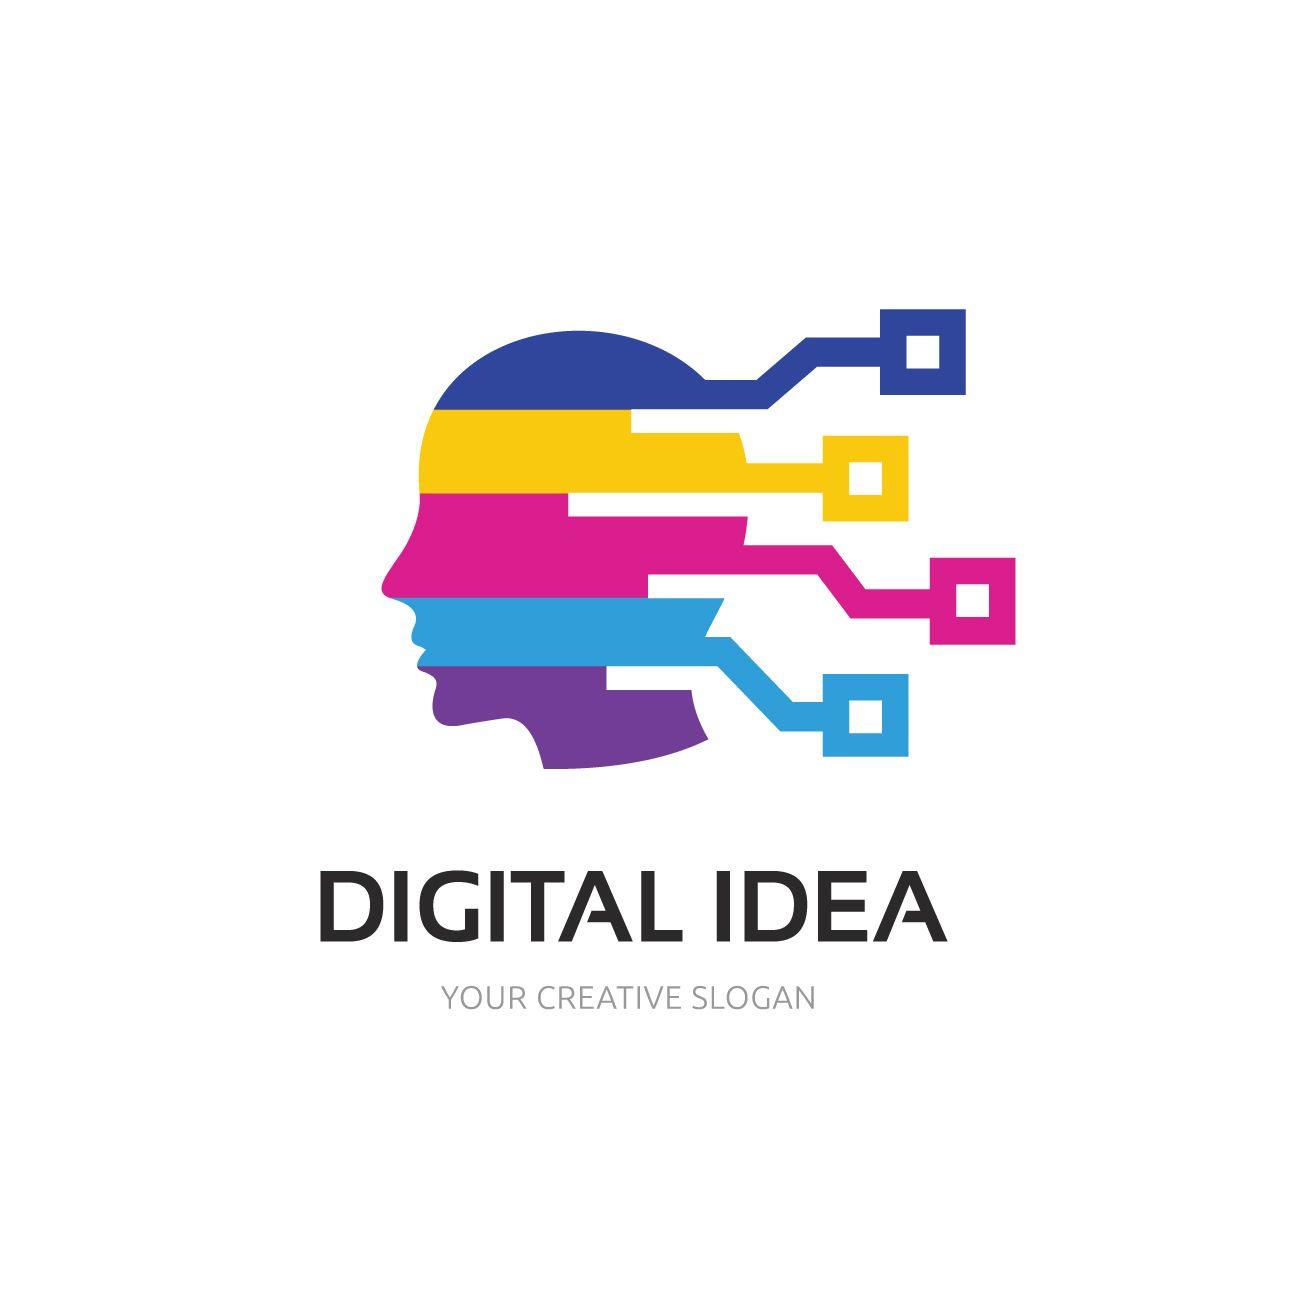 Perfect Digital Media Company Logo Design | Byteknight ...